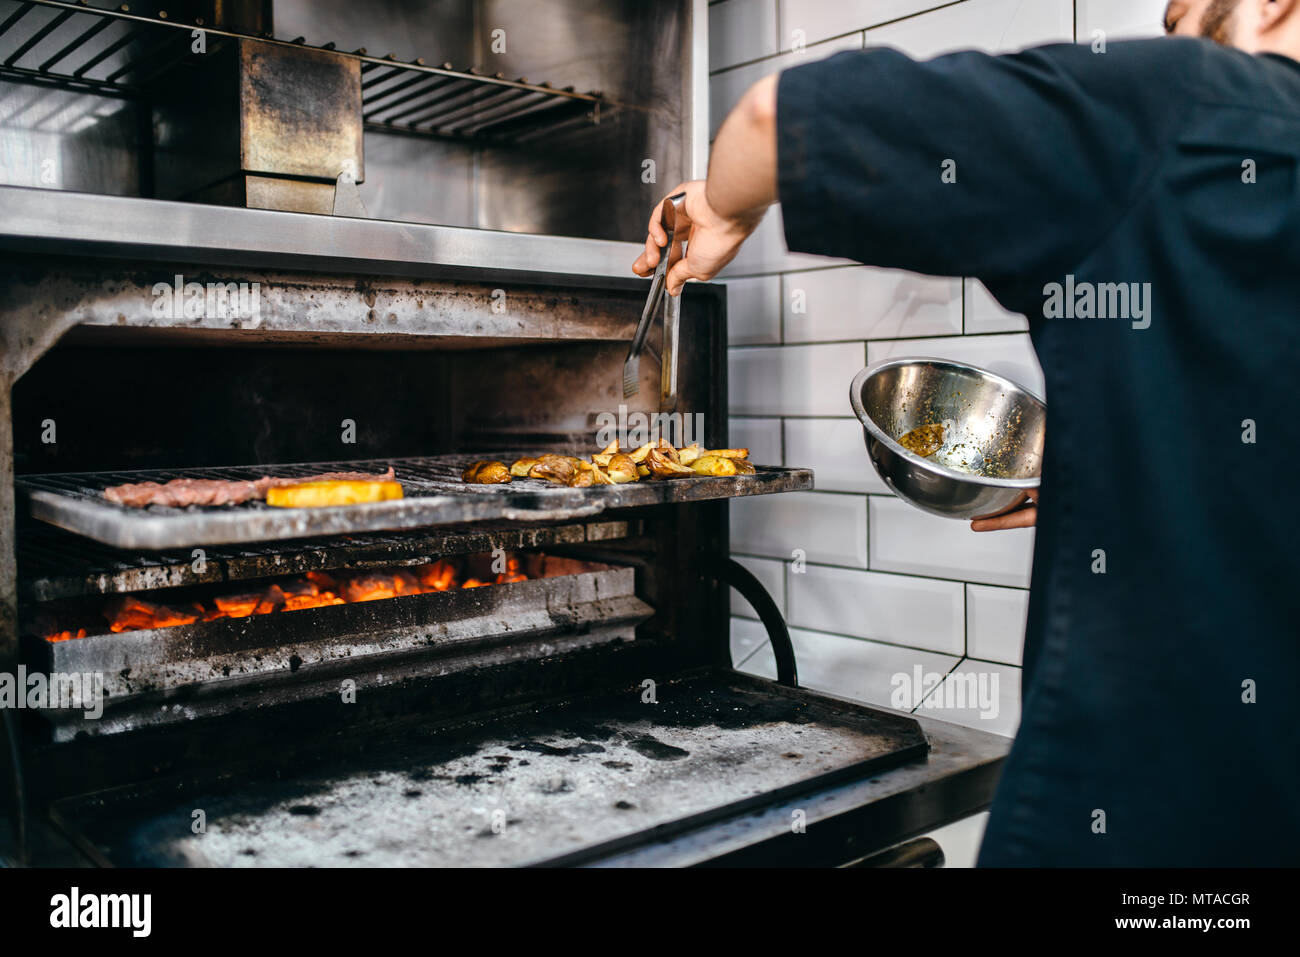 Kochen Hande Bereitet Smoky Fleisch Am Grill Backofen Burger Kochen